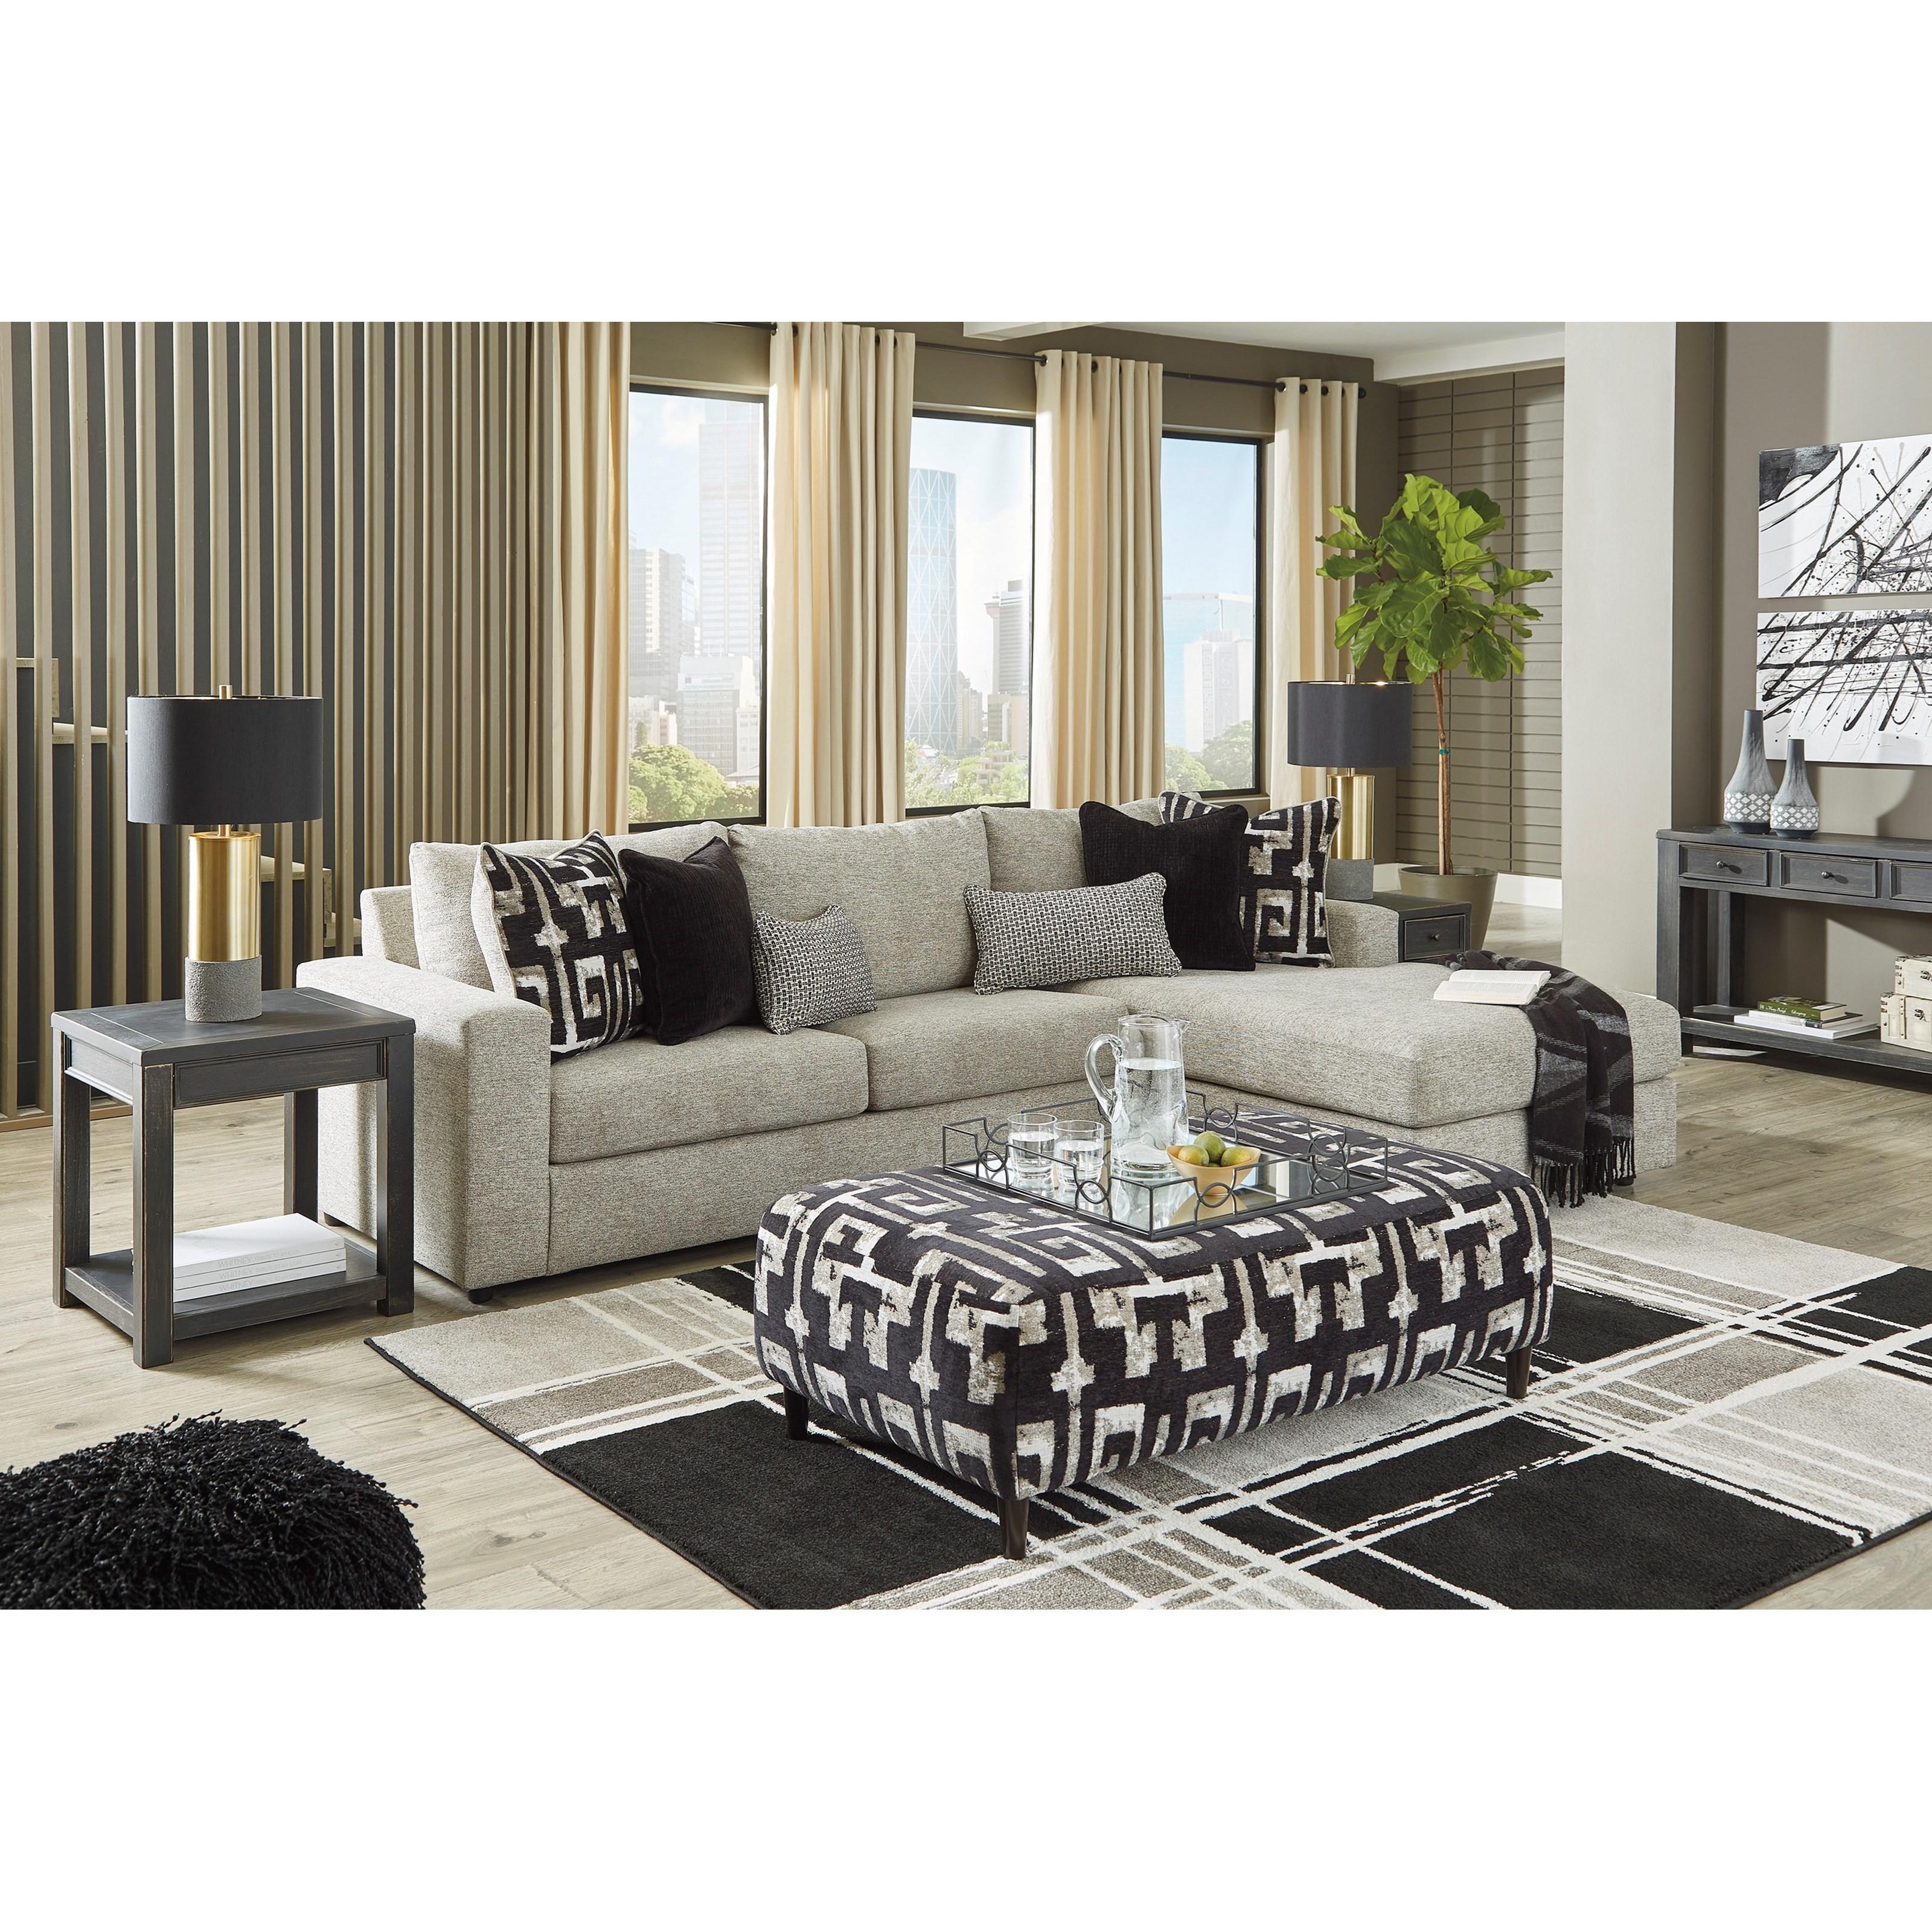 Signature Design By Ashley Ravenstone Living Room Group